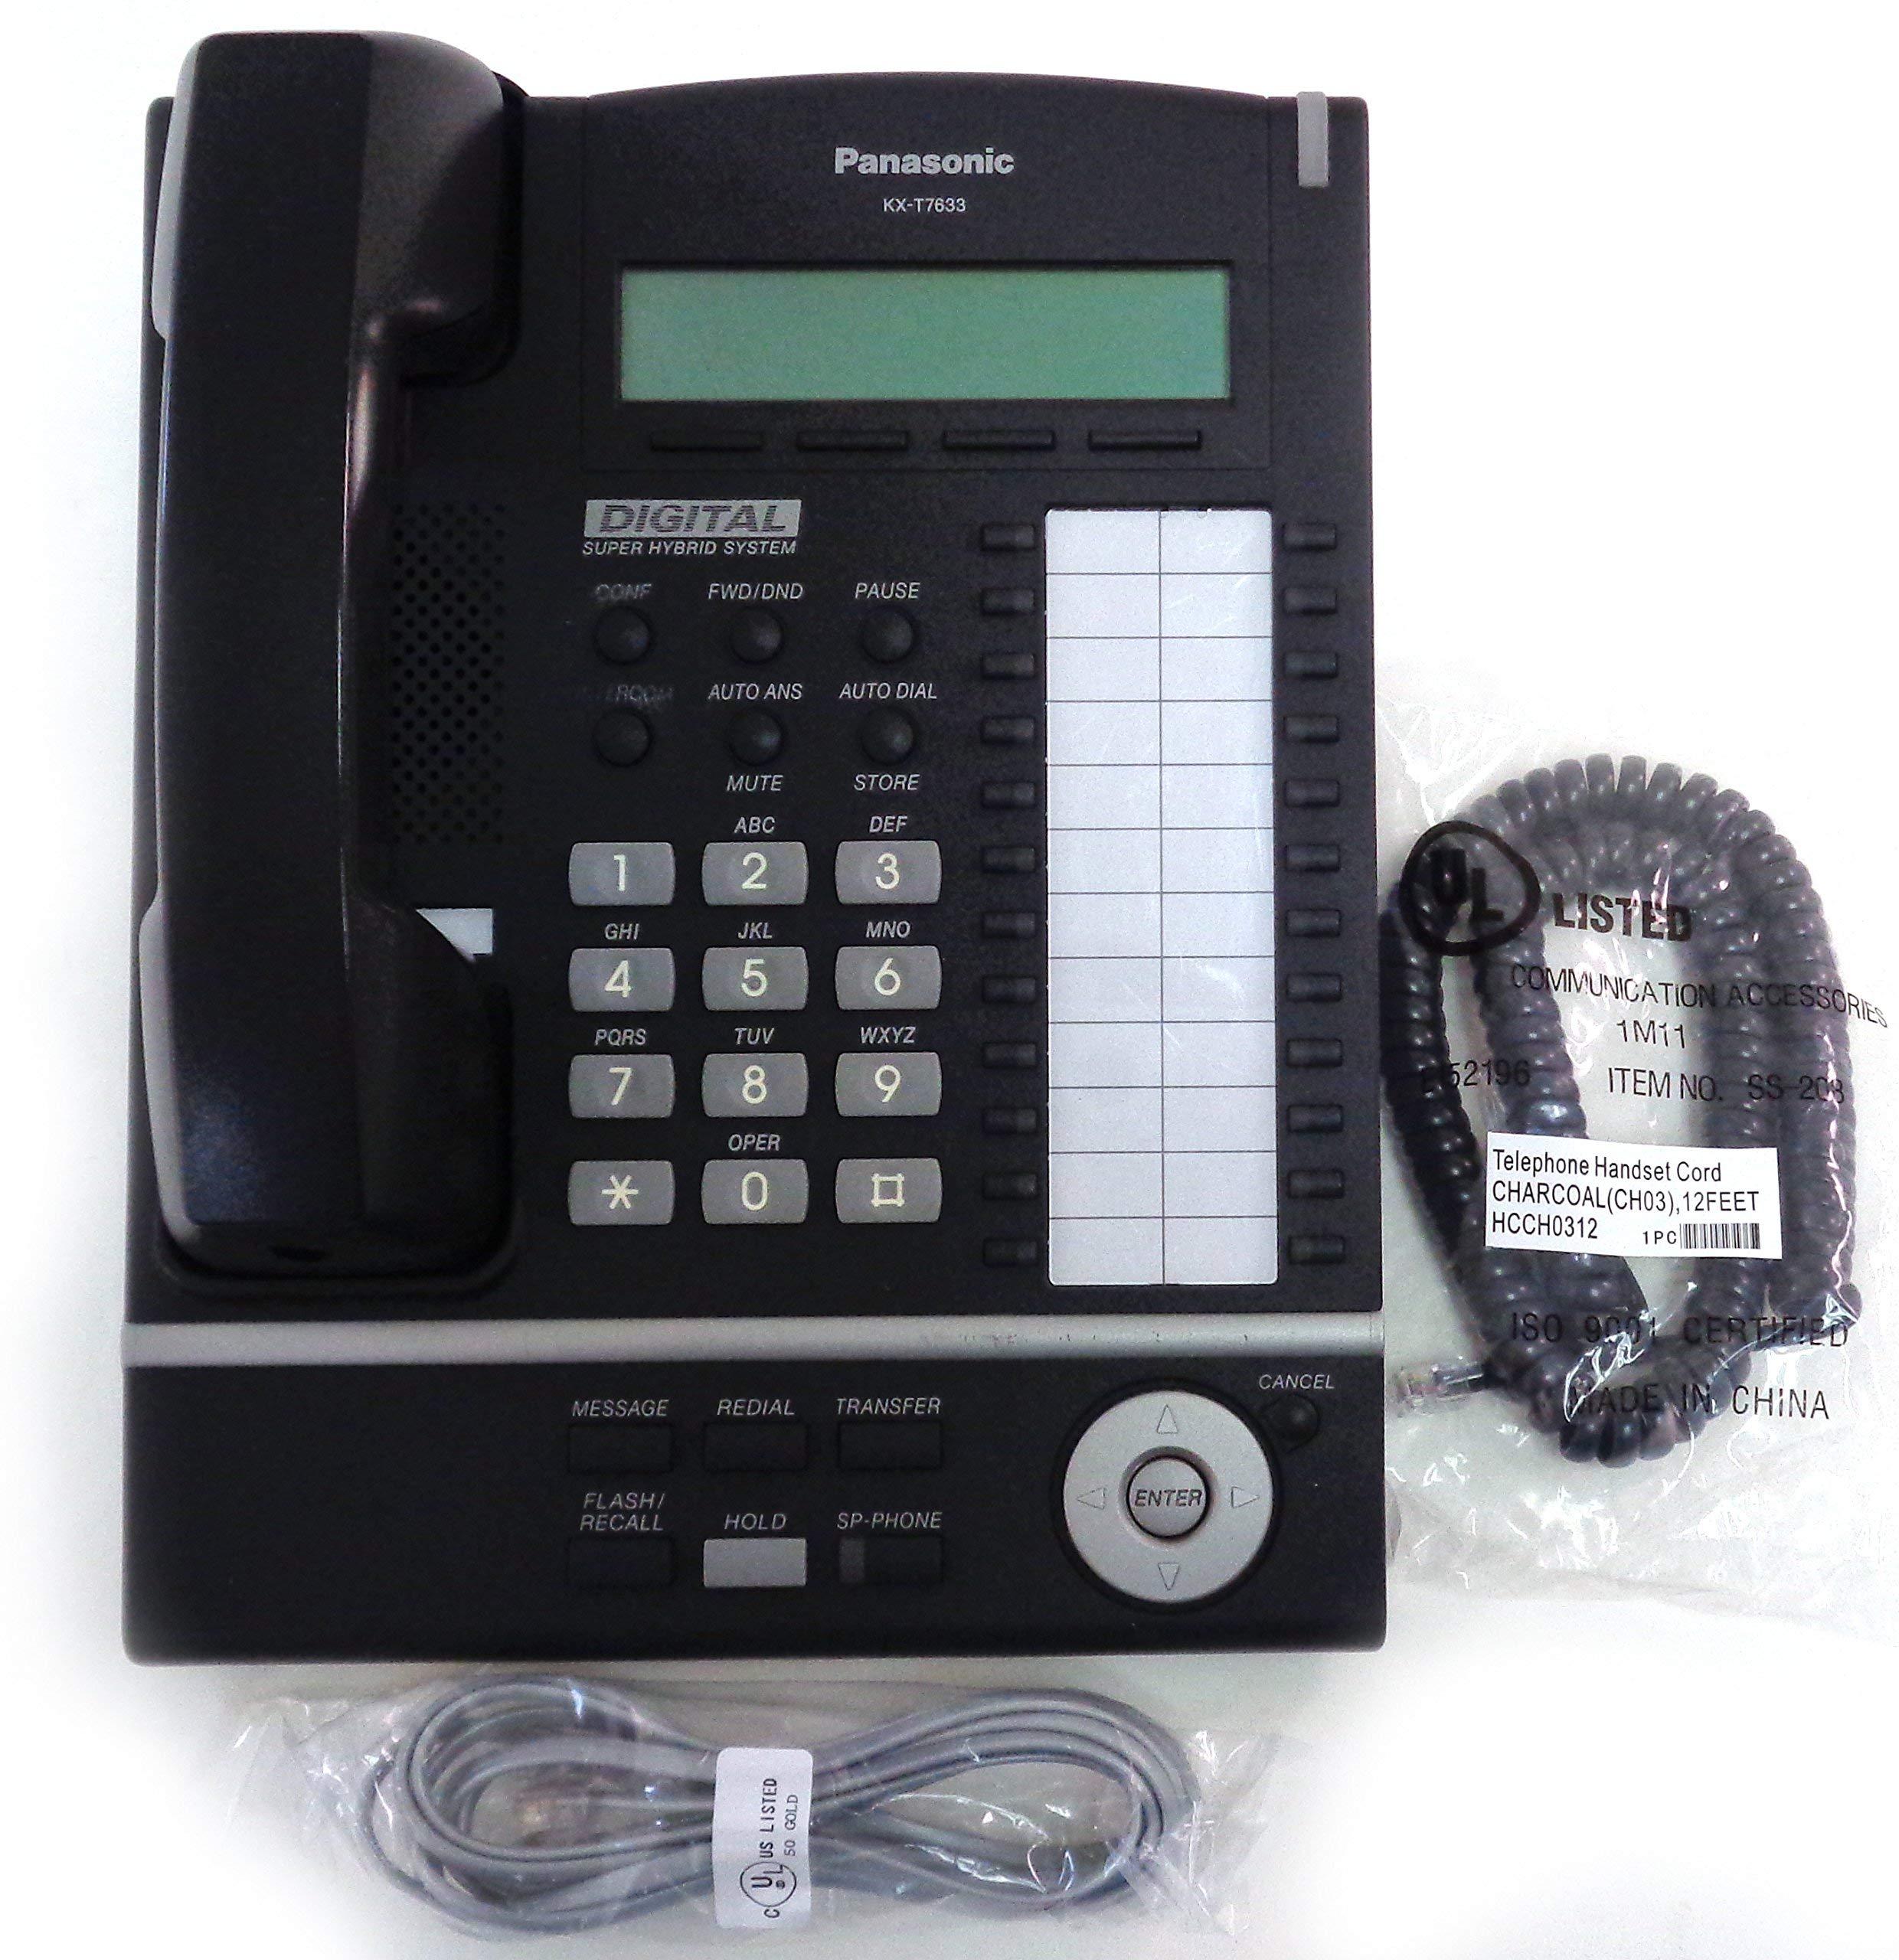 Panasonic KX-T7633 24 Button Backlit Display Speakerphone - Black (Renewed)